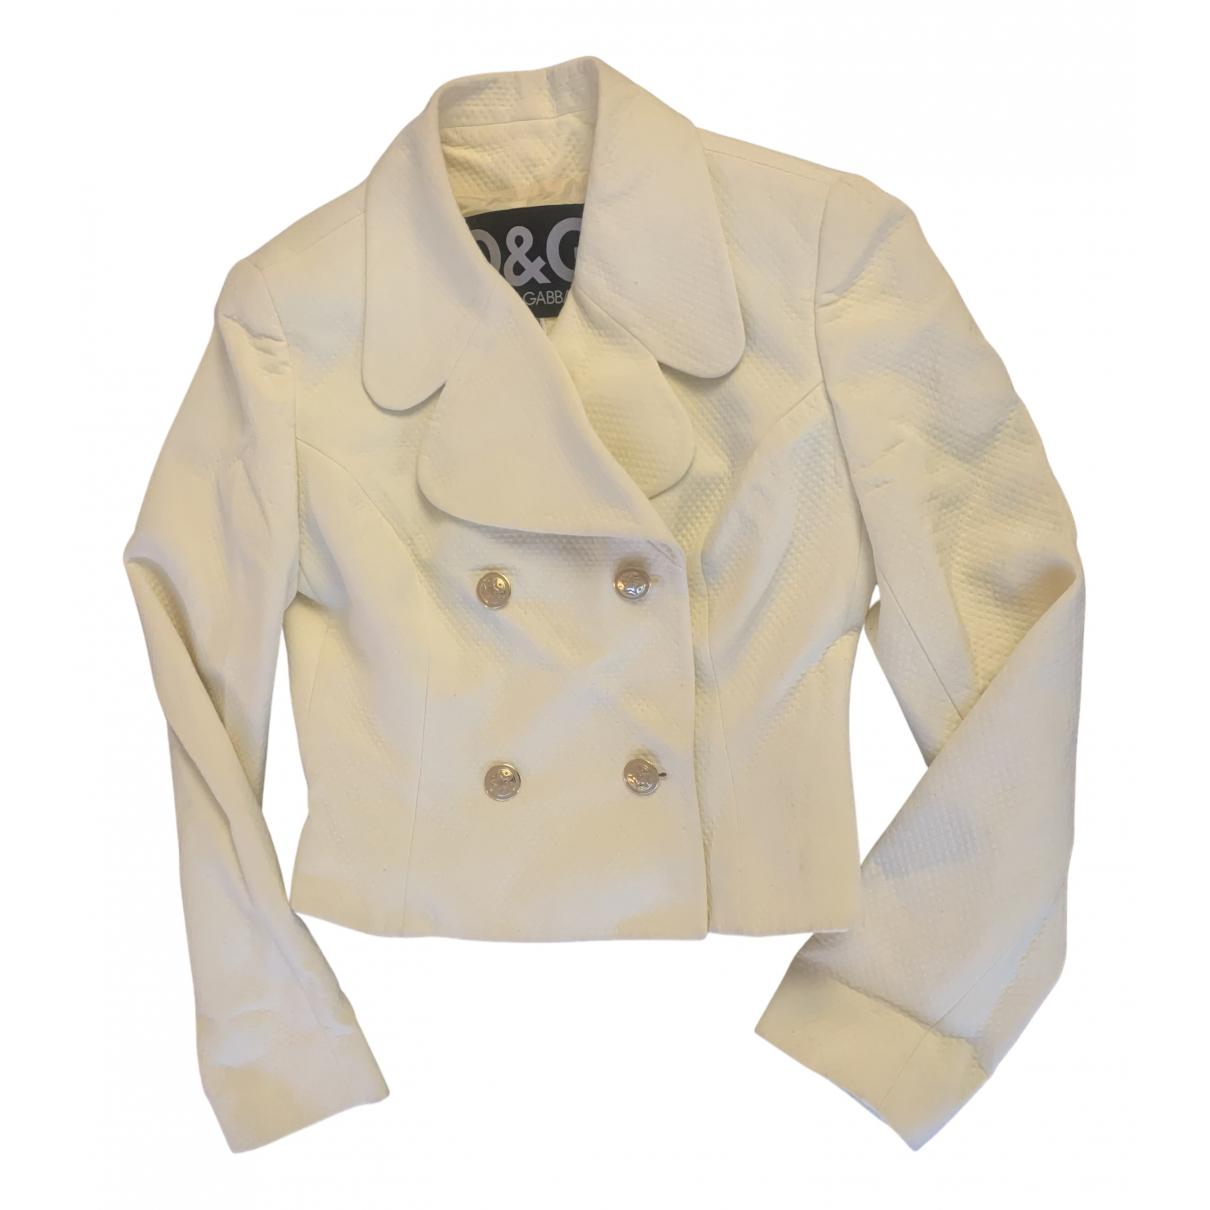 D&g N Ecru Cotton jacket for Women 42 FR